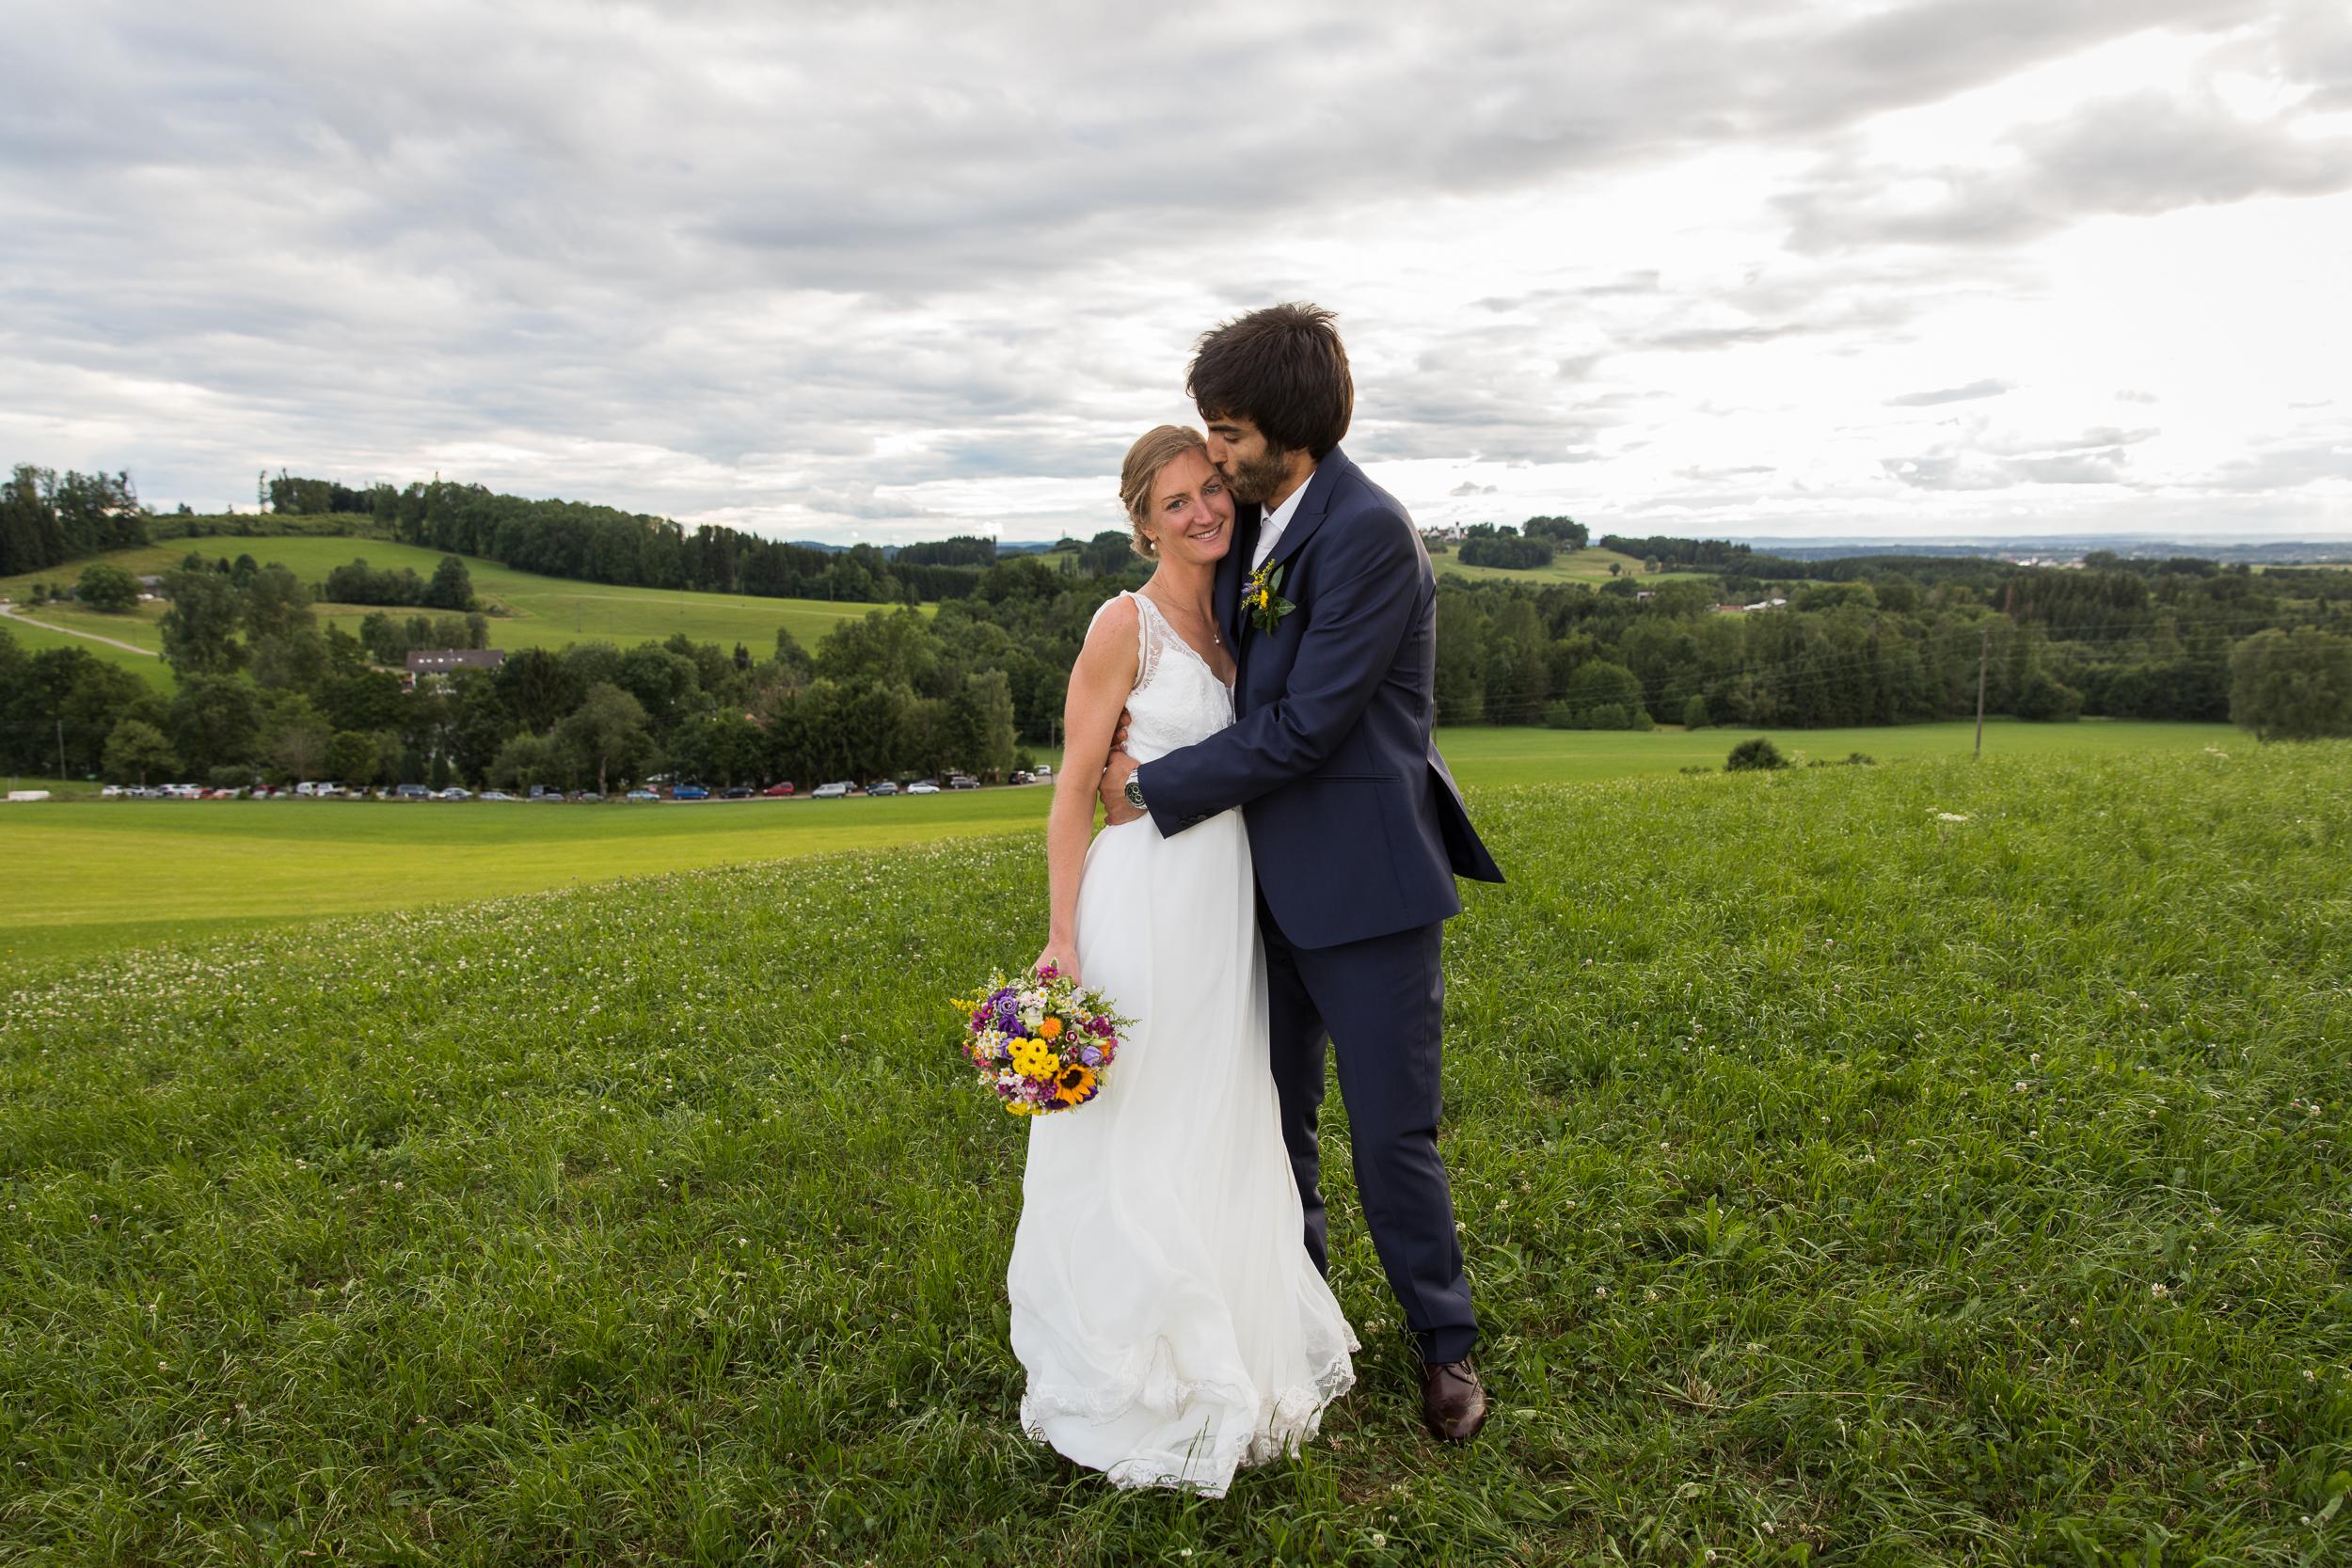 Gregg_Thorne_Wedding_Photographer_Munich_053.jpg